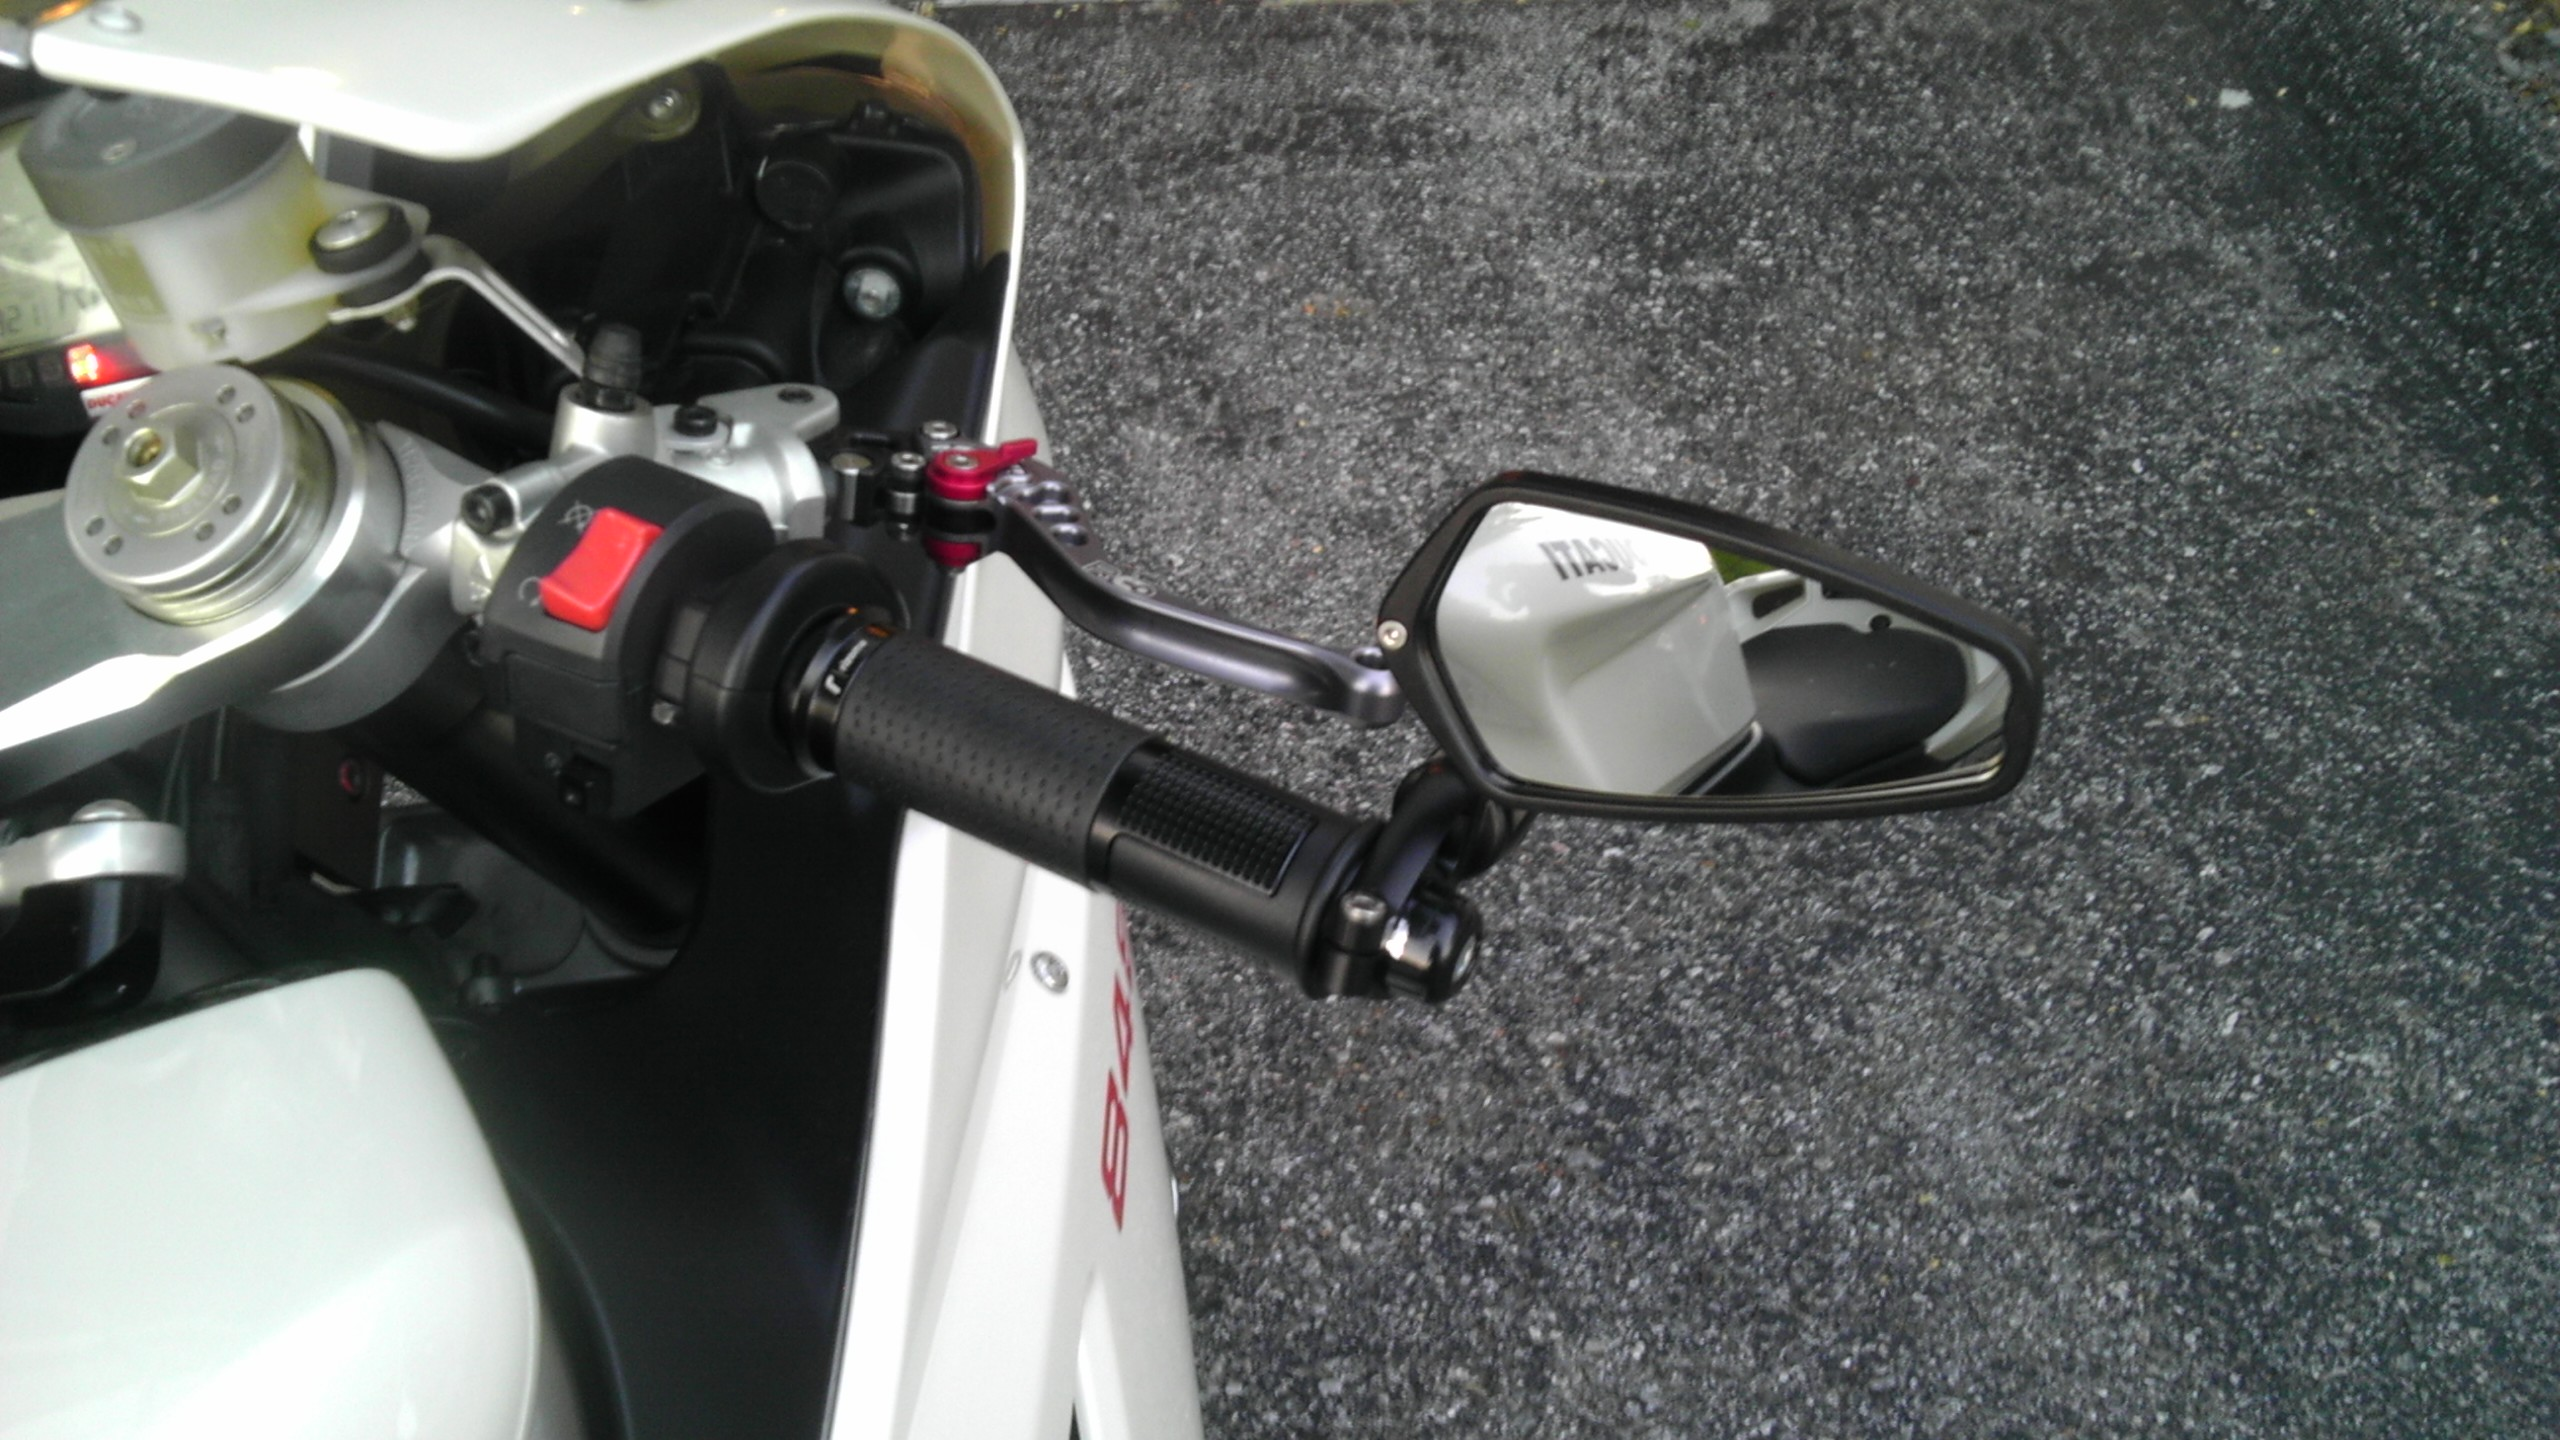 Ducati Mirrors With Indicators